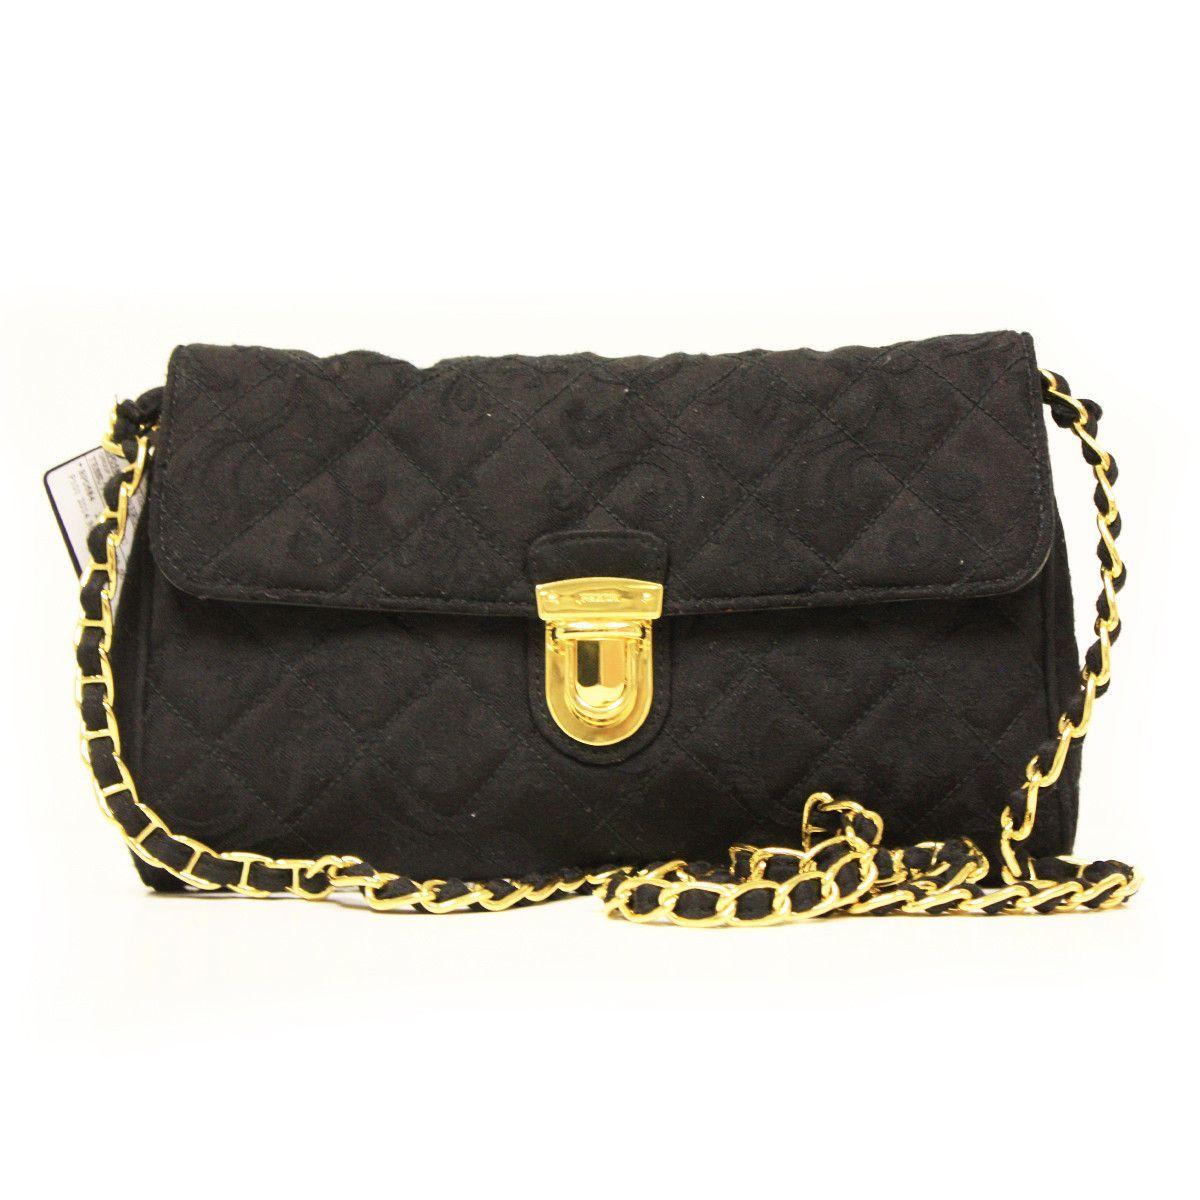 a69b942146762b Prada Nero Tessuto Impuntu Pattina Black Quilted Nylon & Leather Chain Bag